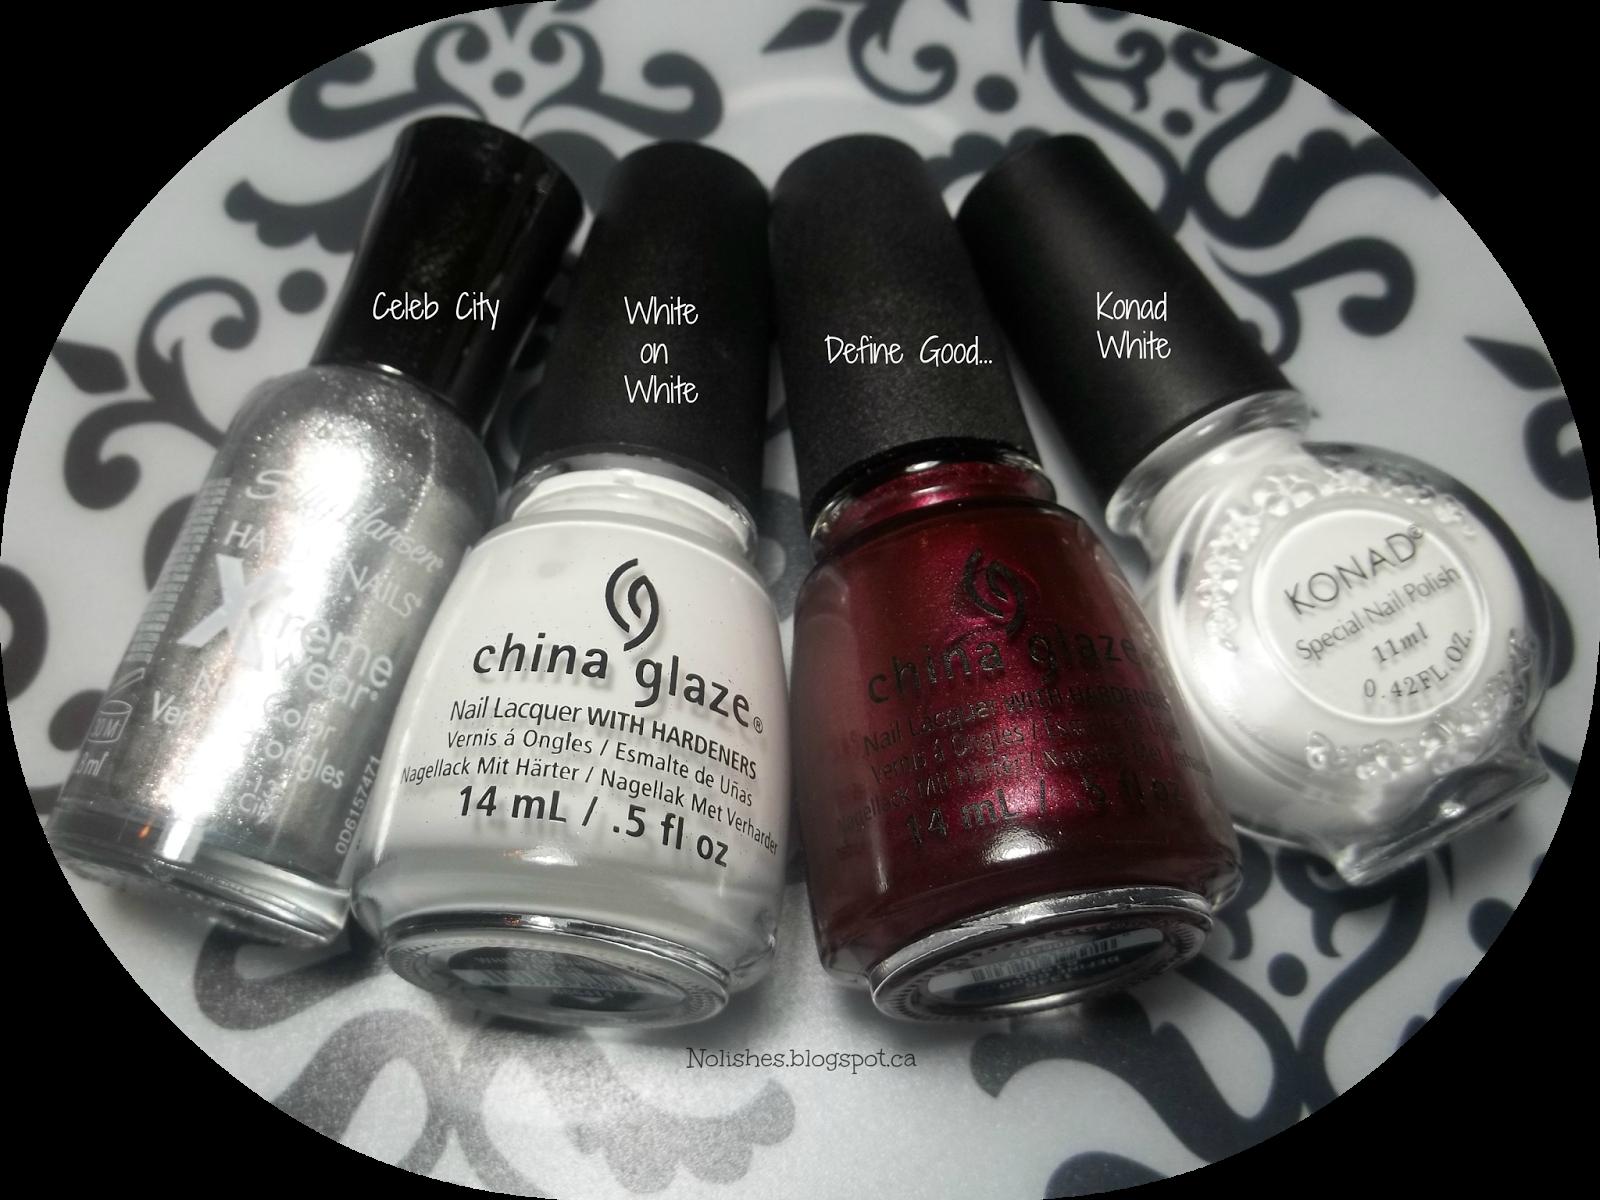 Sally Hansen Xtreme Wear 'Celeb City', China Glaze 'White on White', China Glaze 'Define Good...', and Konad Special Polish in White